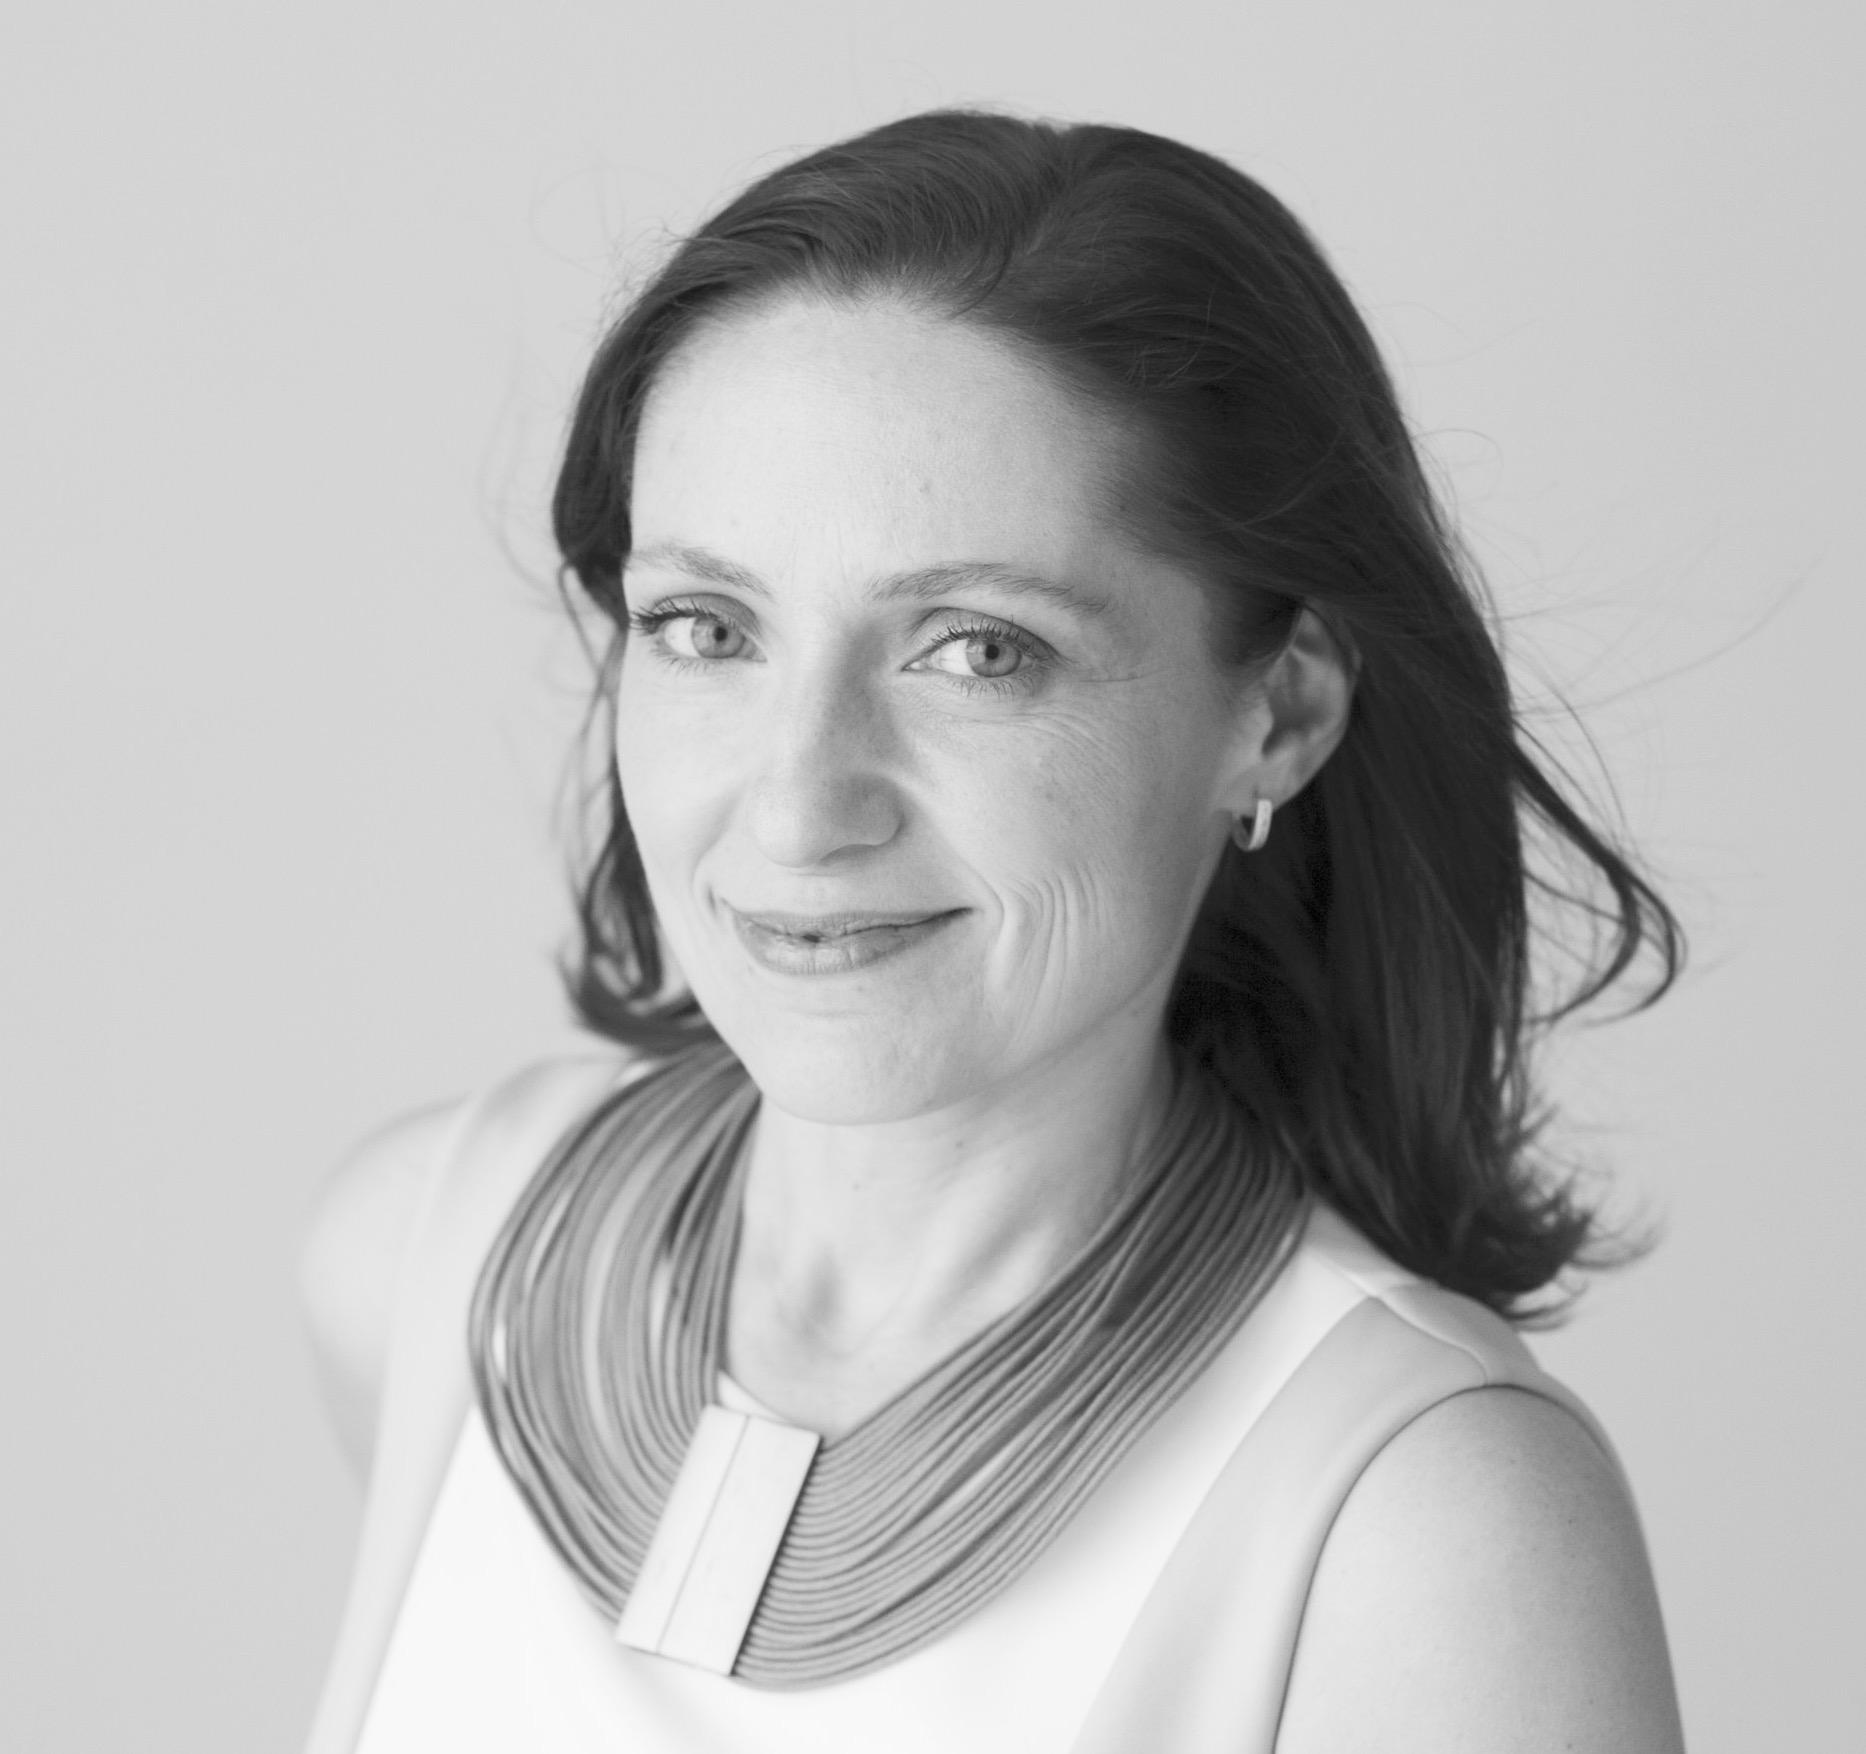 Iva Teixeira